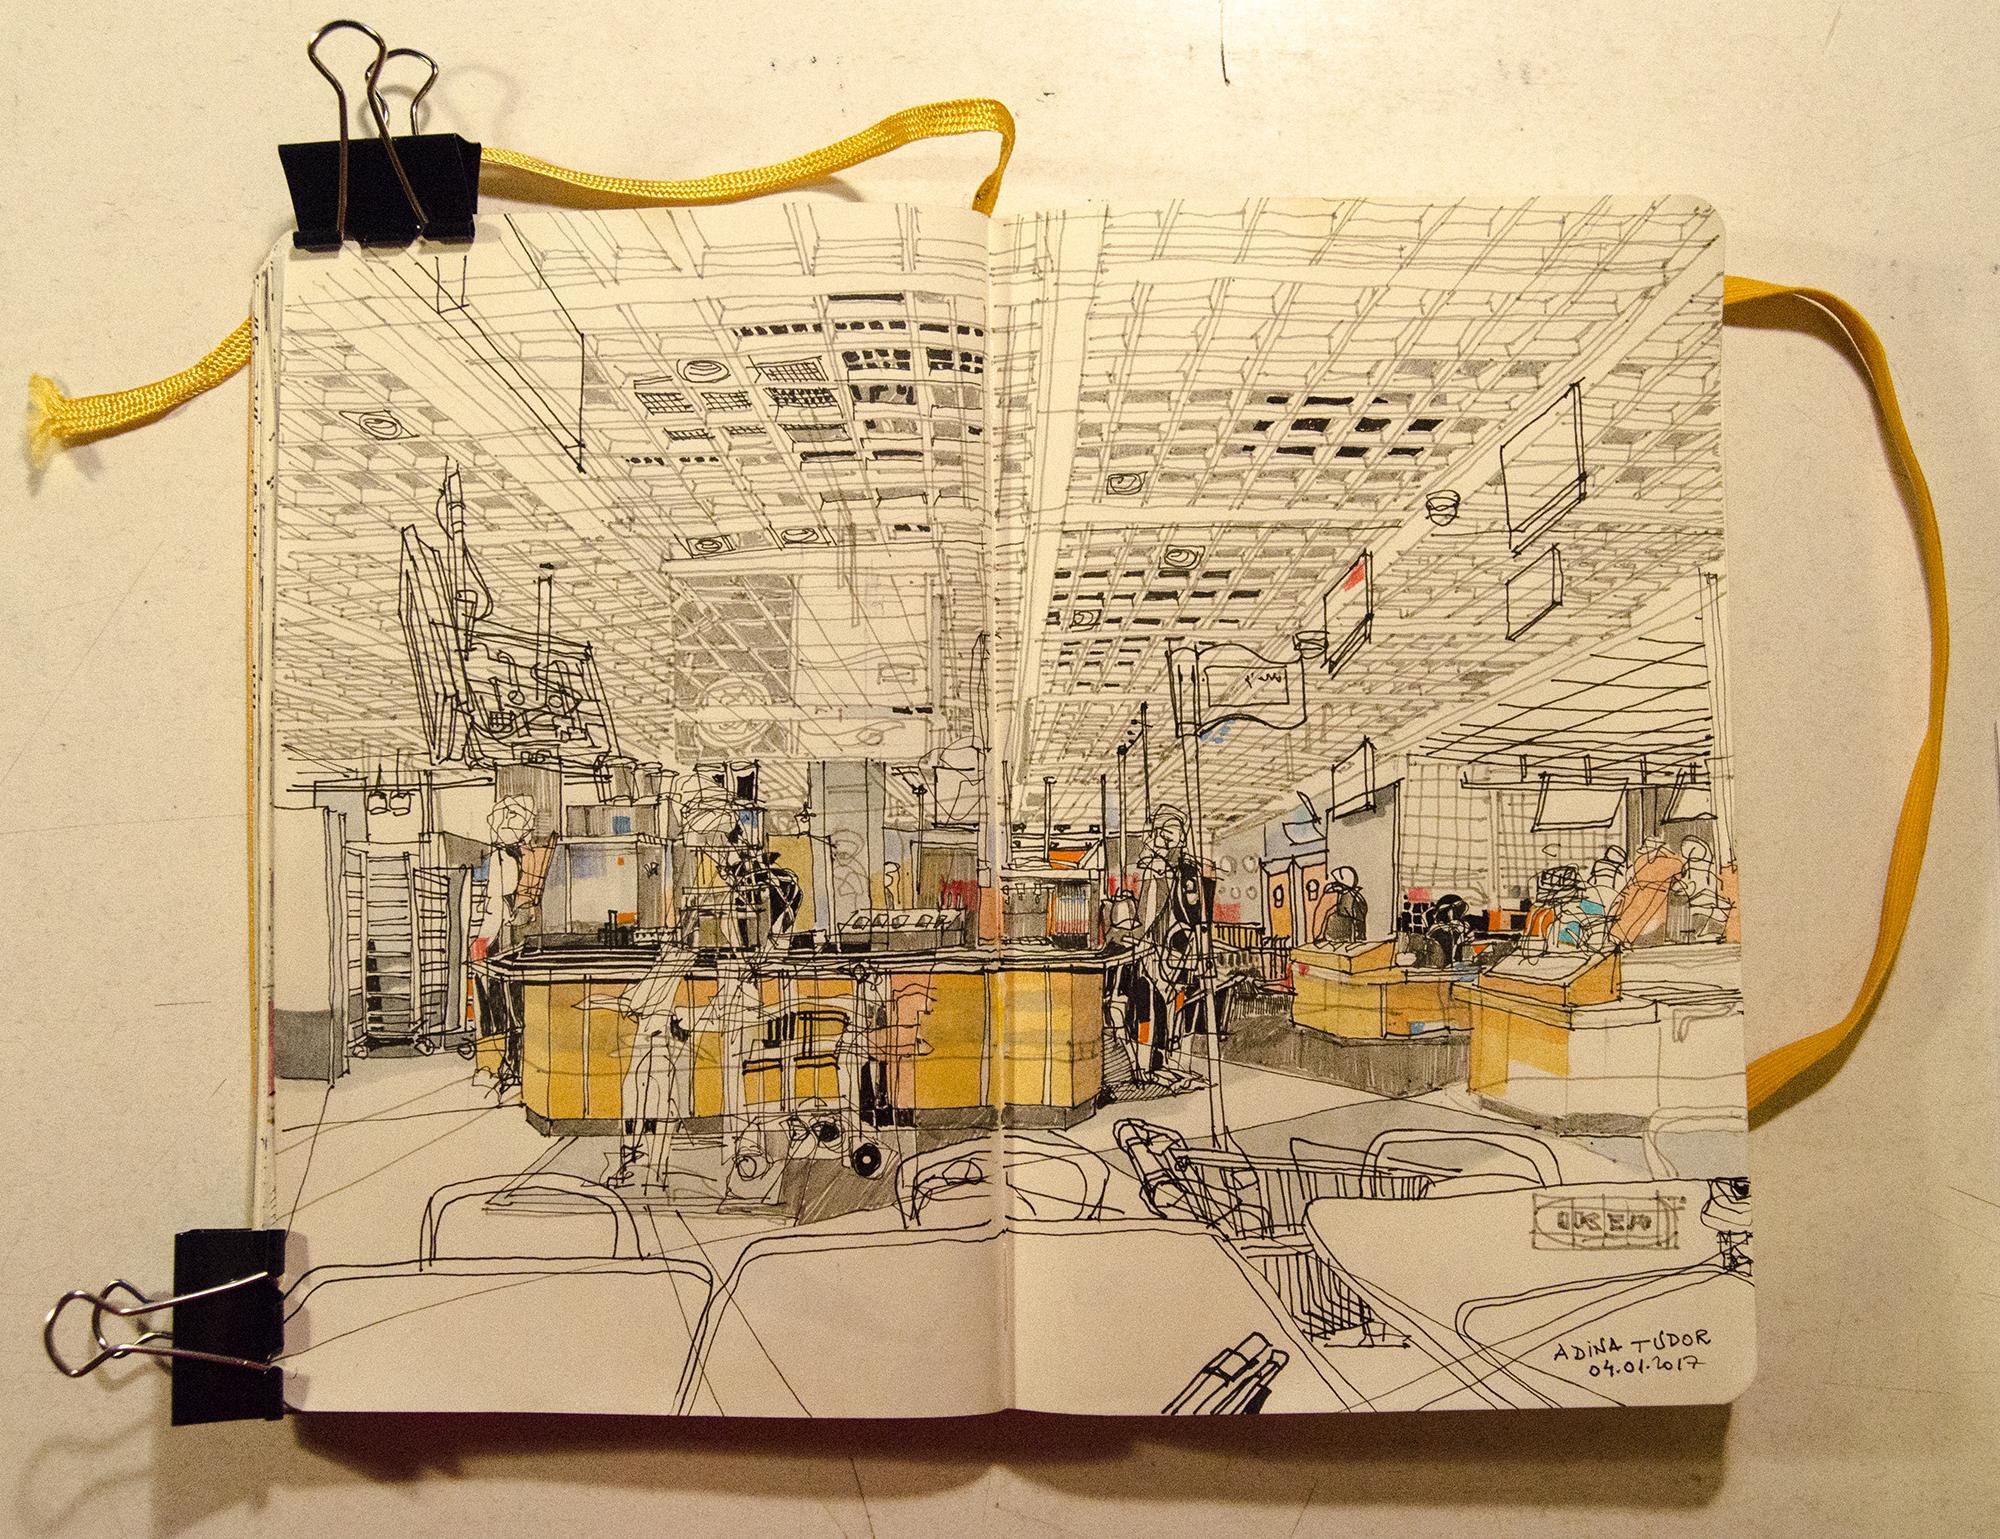 Interior Sketch At Ikea Restaurant Mymoleskine Community Electrical Wiring Diagrams